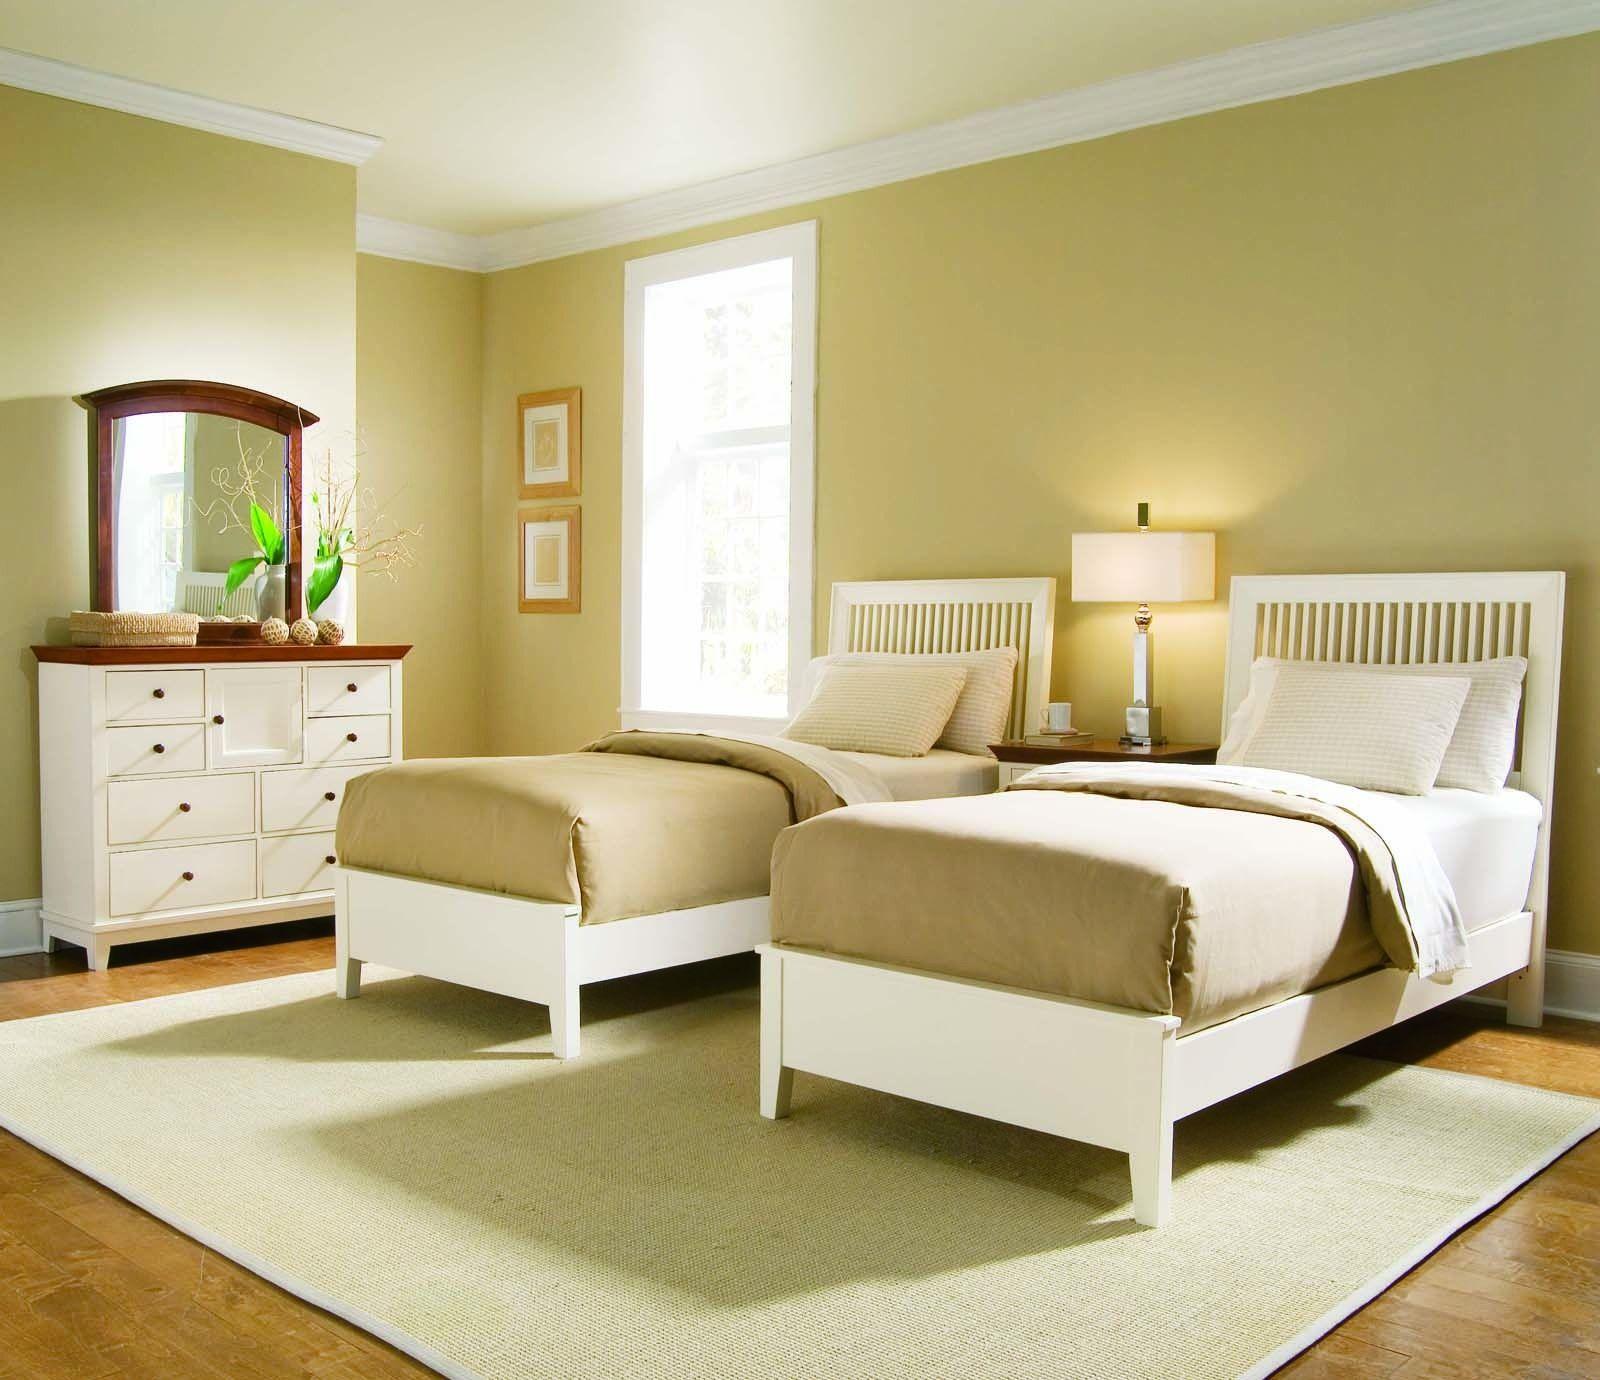 Bedroom Furniture Design Ideas Bedroom Sets 2 Twin Beds  Design Ideas 20172018  Pinterest